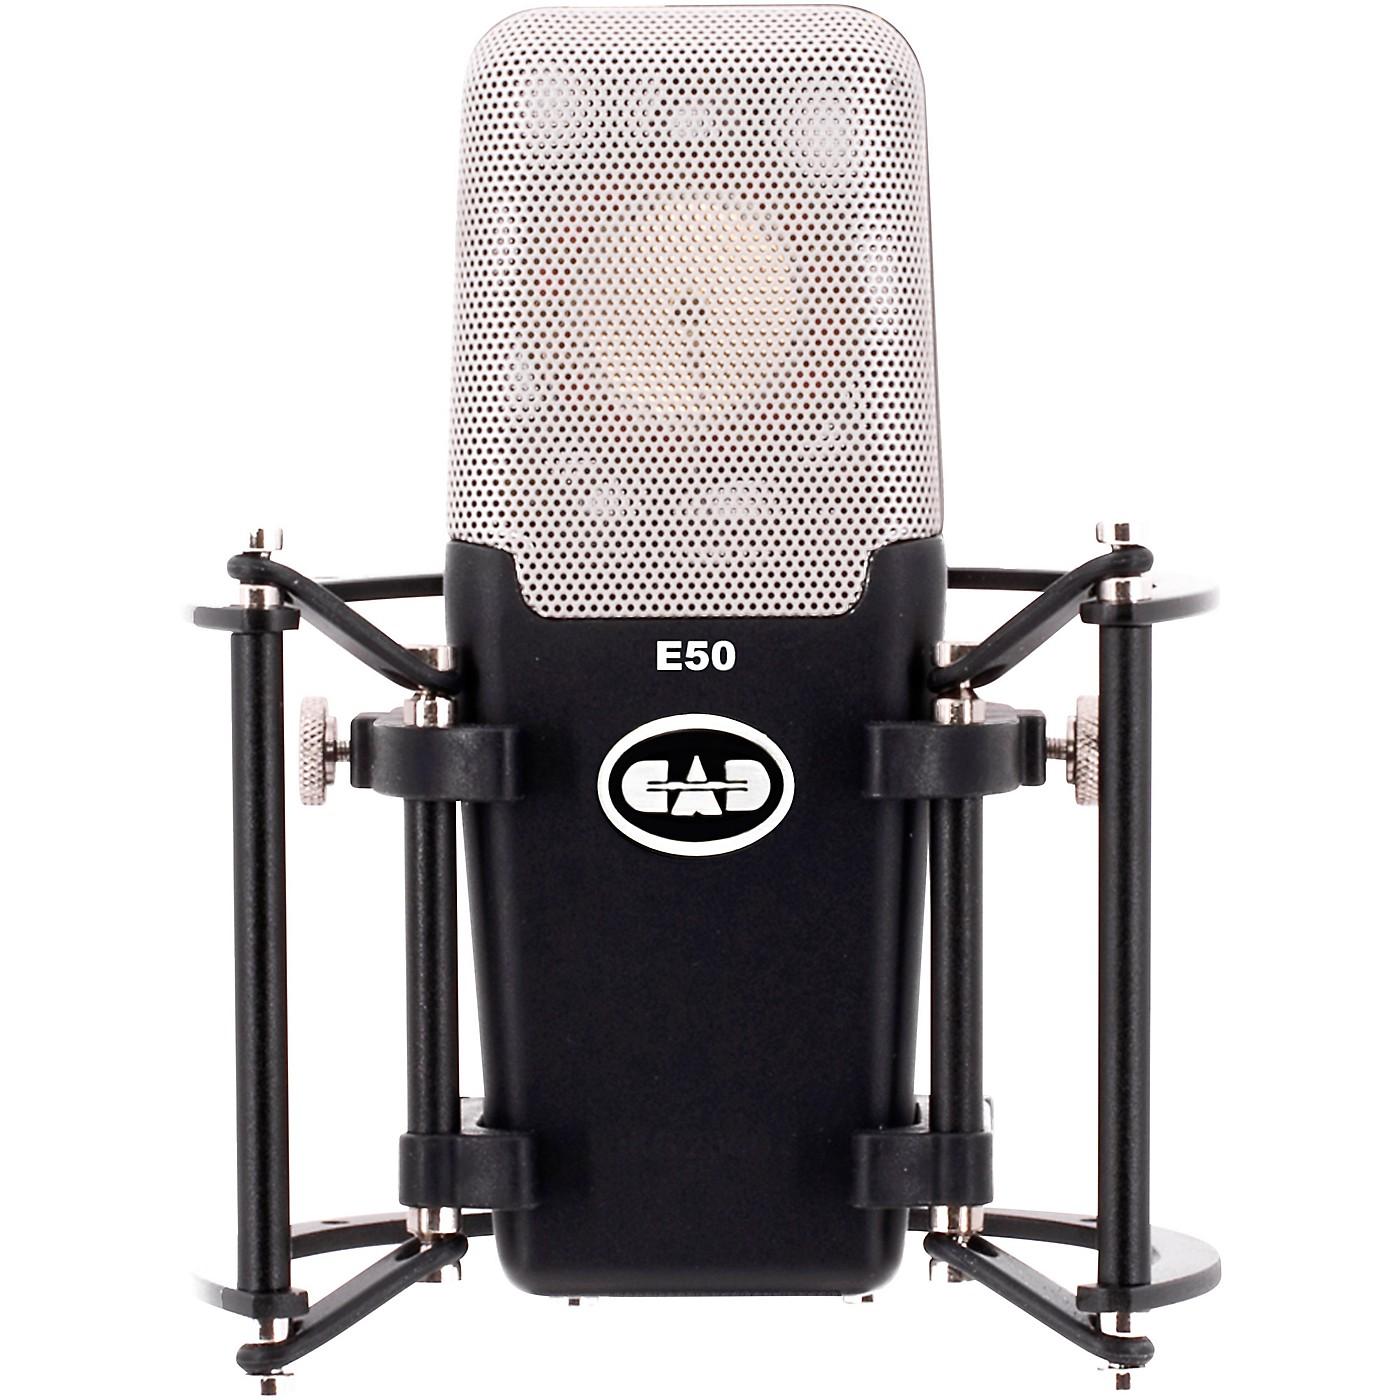 CAD E50 Equitek Large Diaphragm Side Address Studio Condenser Microphone thumbnail